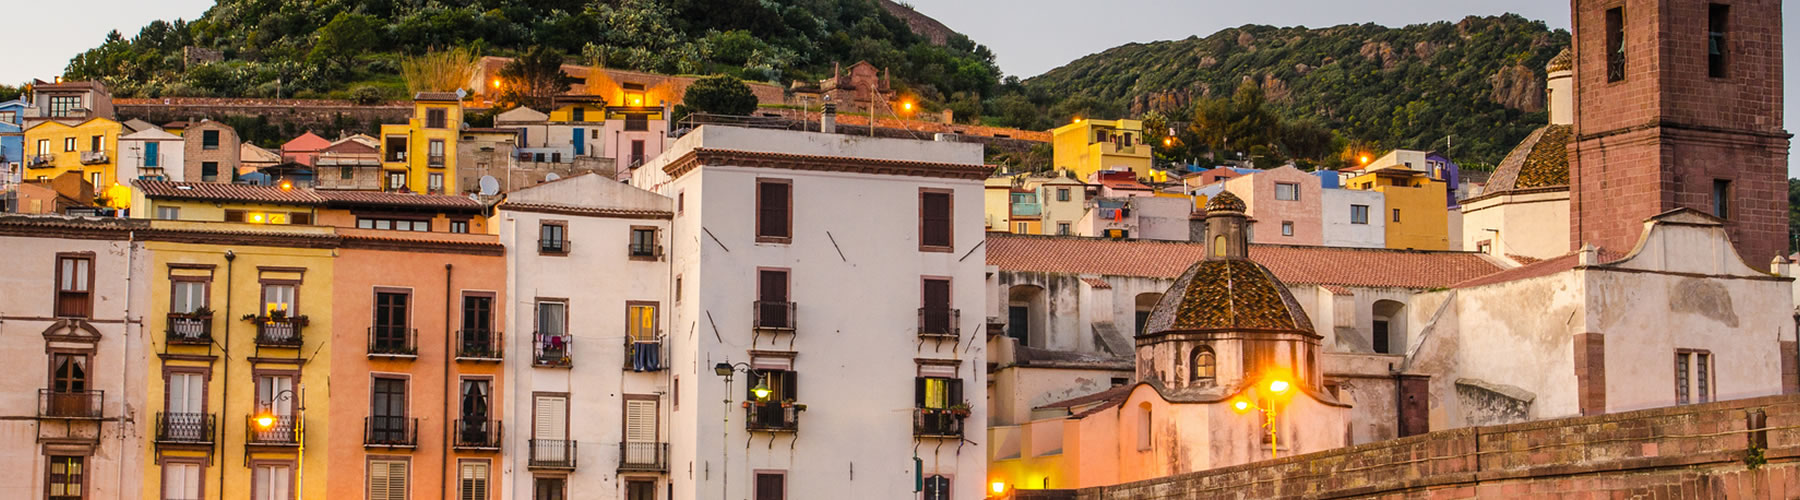 Apartamentos Corte Fiorita Bosa Albergo Diffuso